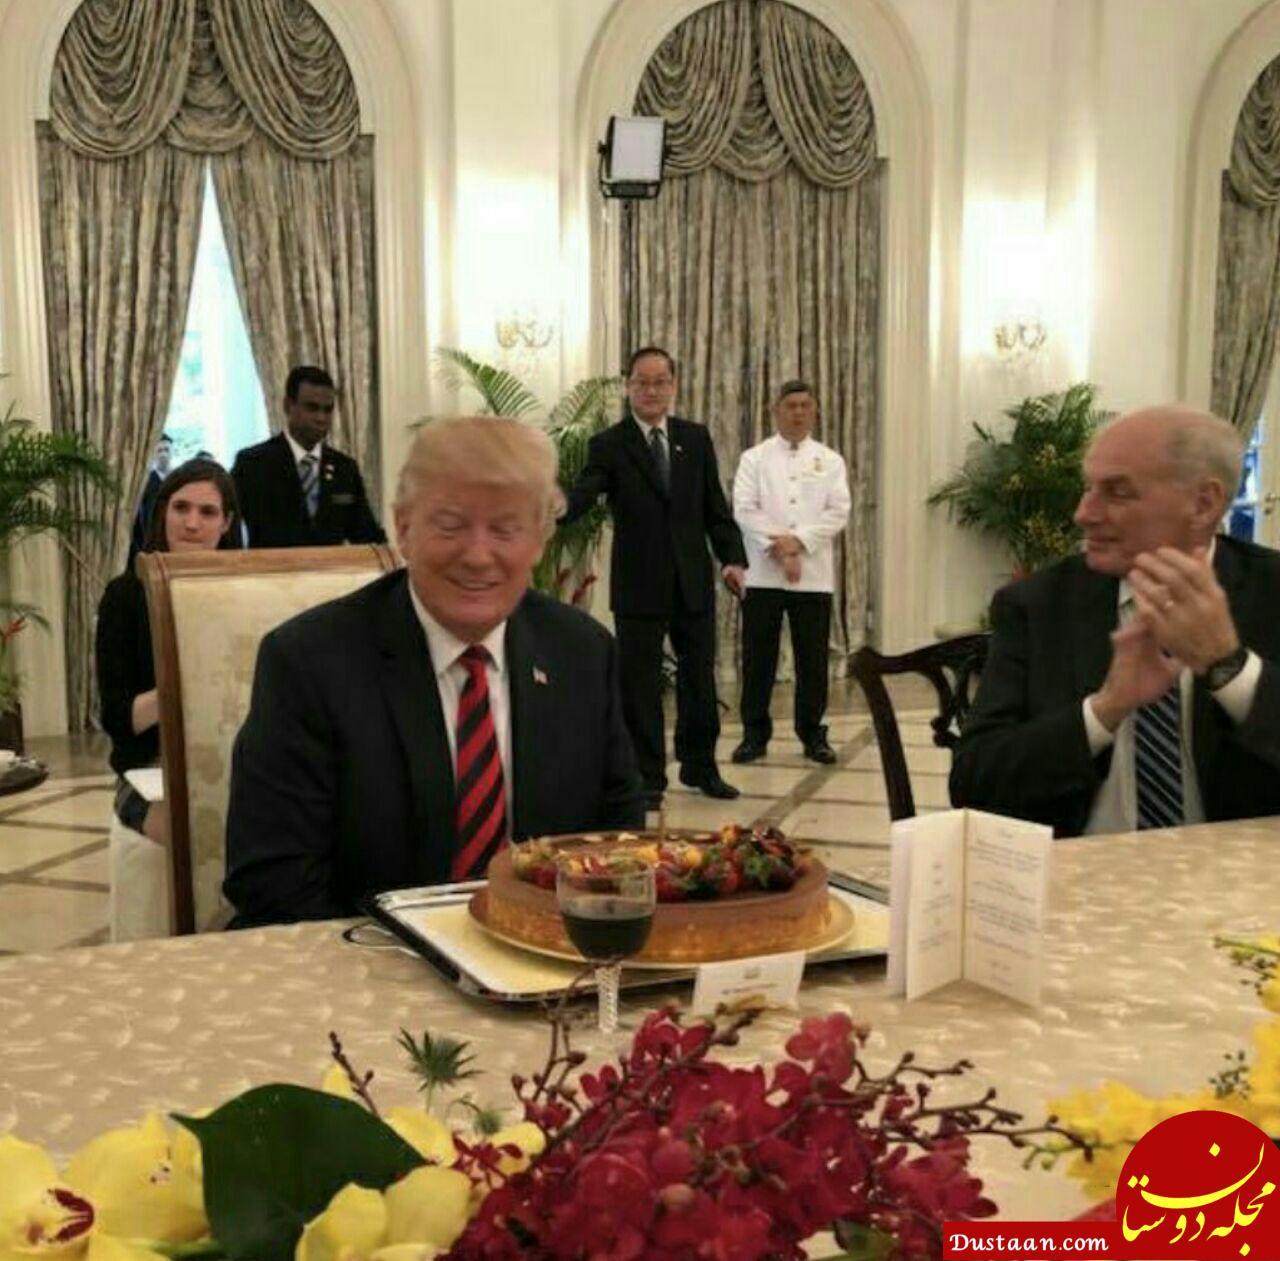 www.dustaan.com جشن تولد زود هنگام برای ترامپ در سنگاپور! +عکس